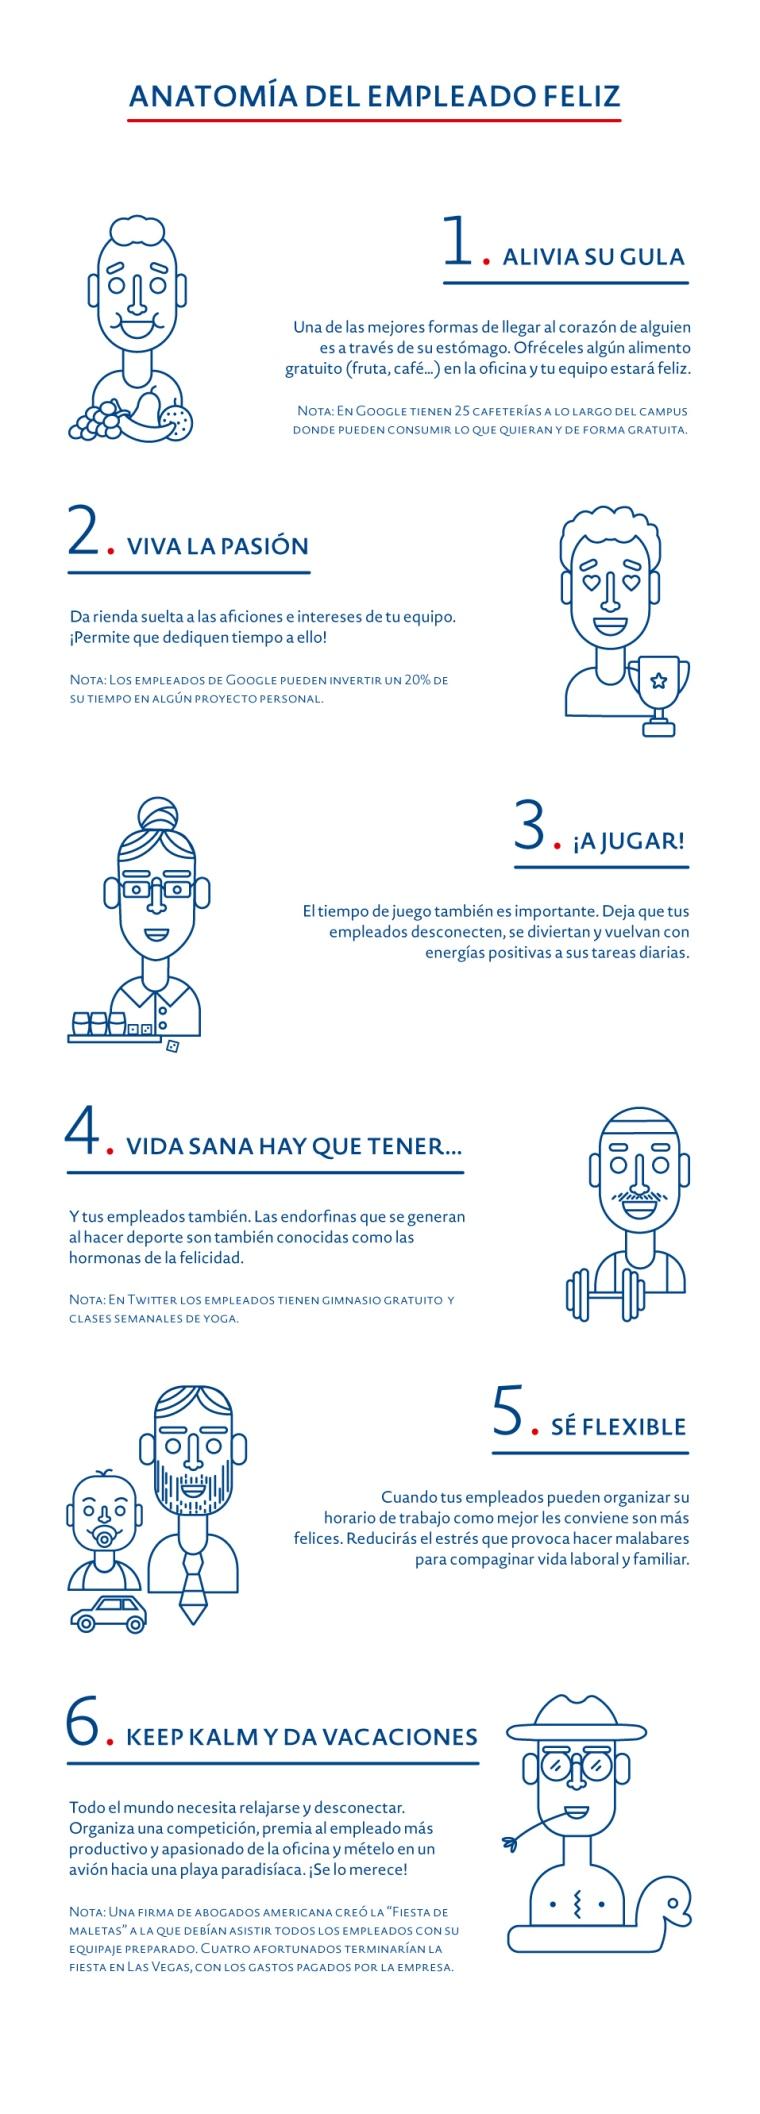 InfografiaEmpleadoFeliz.jpg